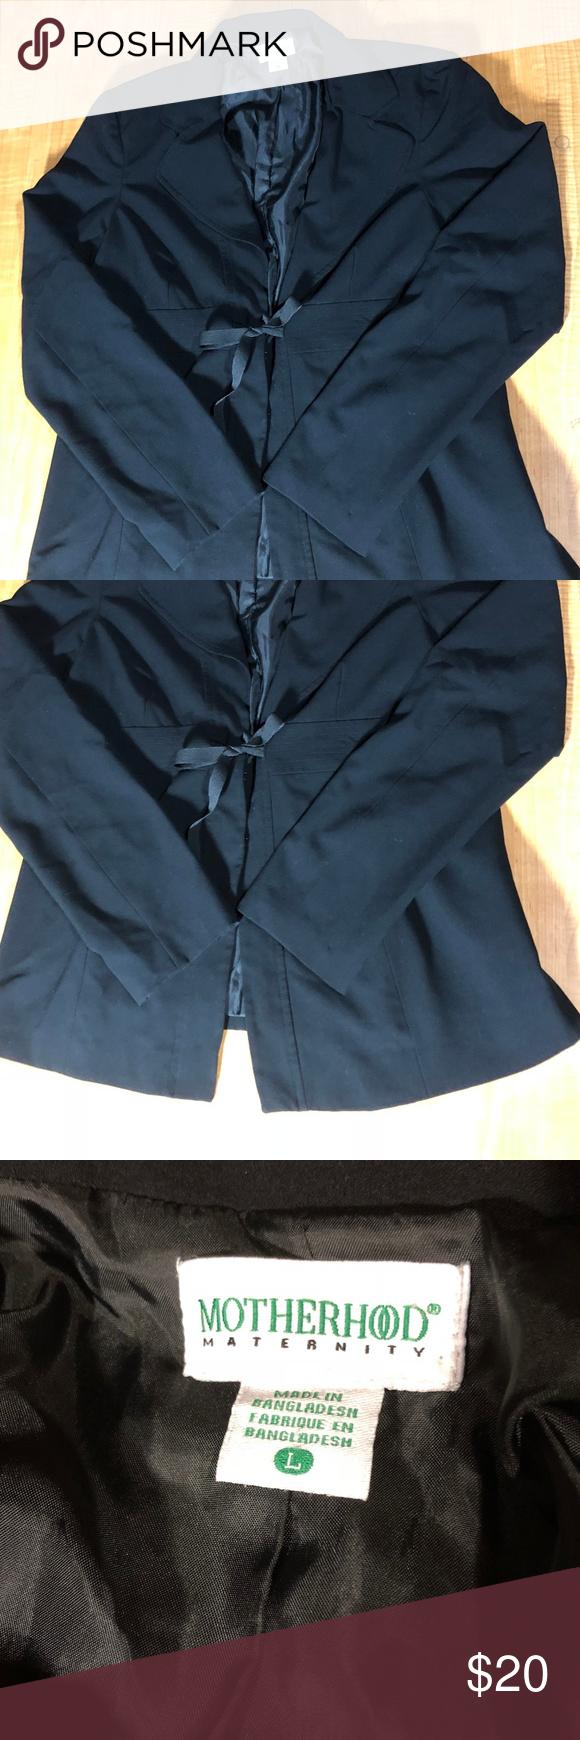 e84d2fda1eb51 Motherhood Maternity Blazer Jacket - Size L This is a maternity blazer  jacket by Motherhood Maternity, size L, color black. Measurements are  length 29